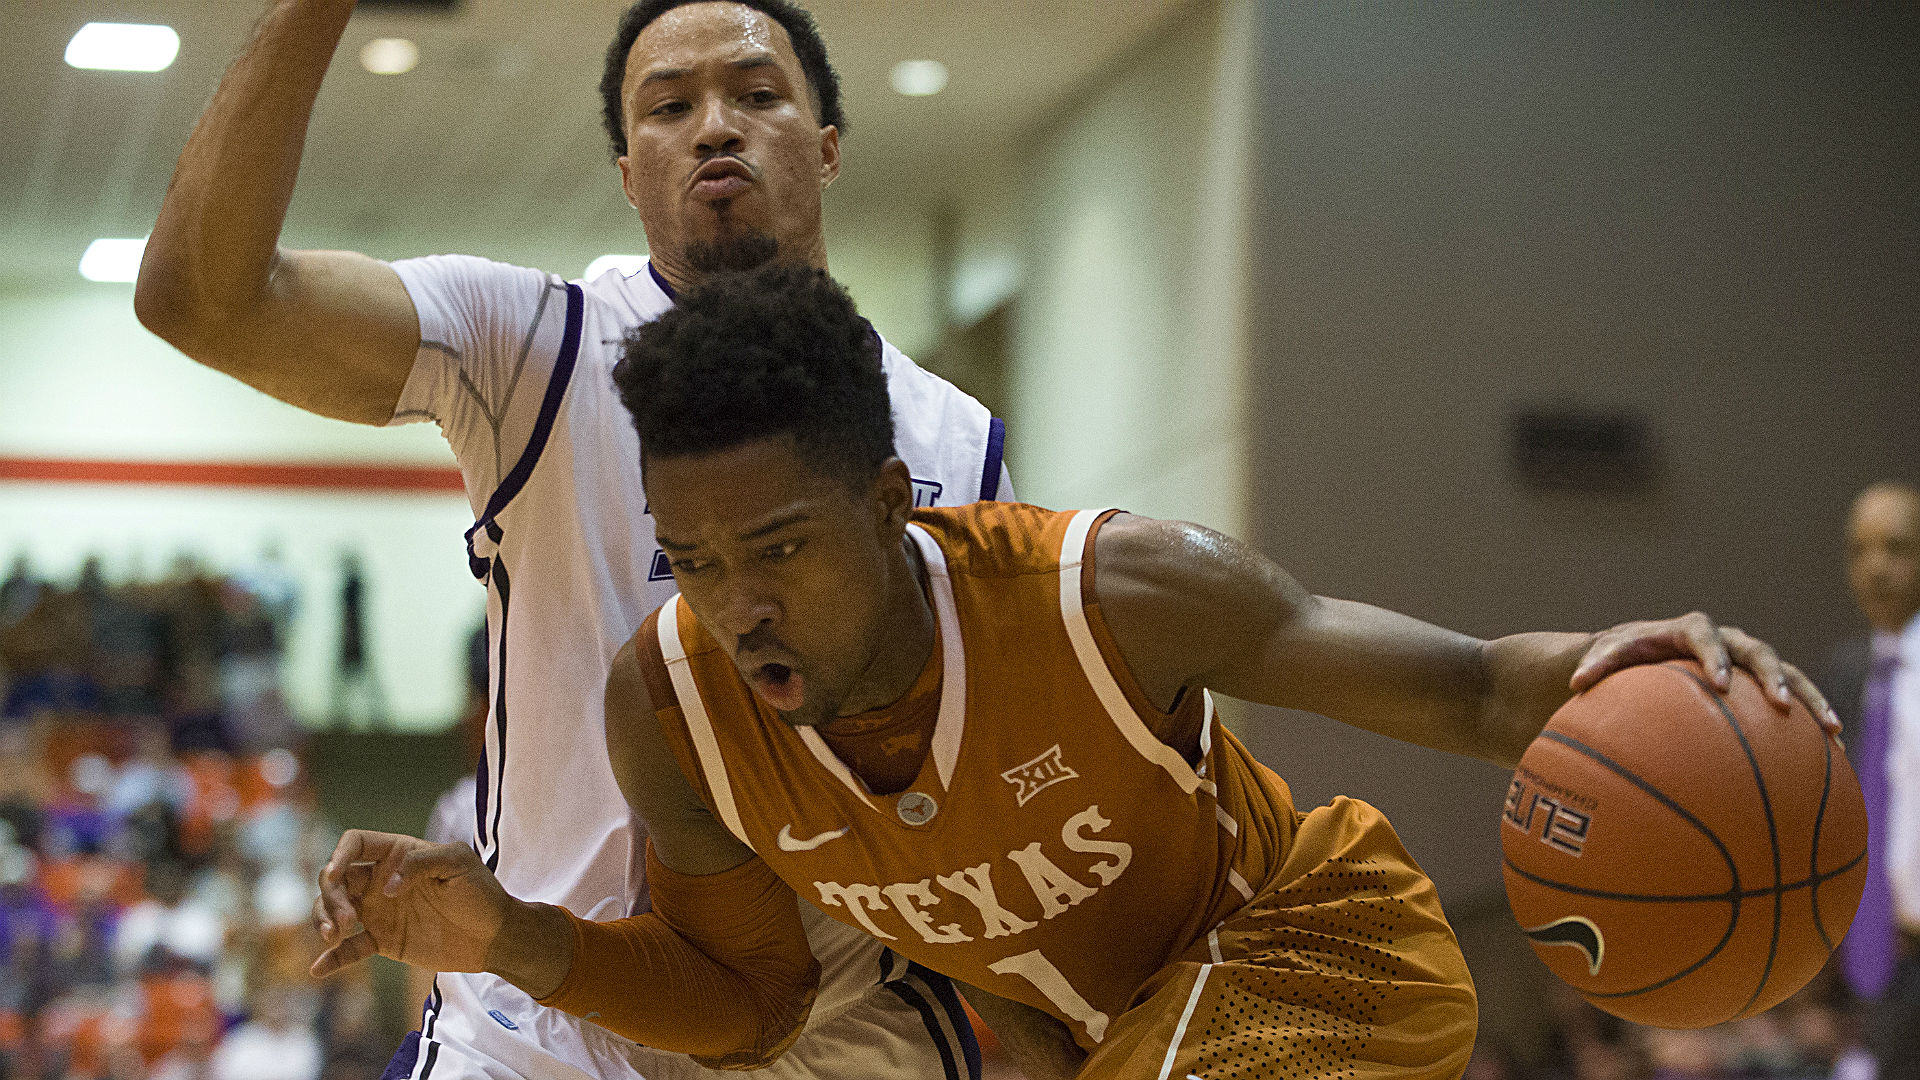 College basketball betting lines and picks – Kansas, Texas clash in key Big 12 showdown